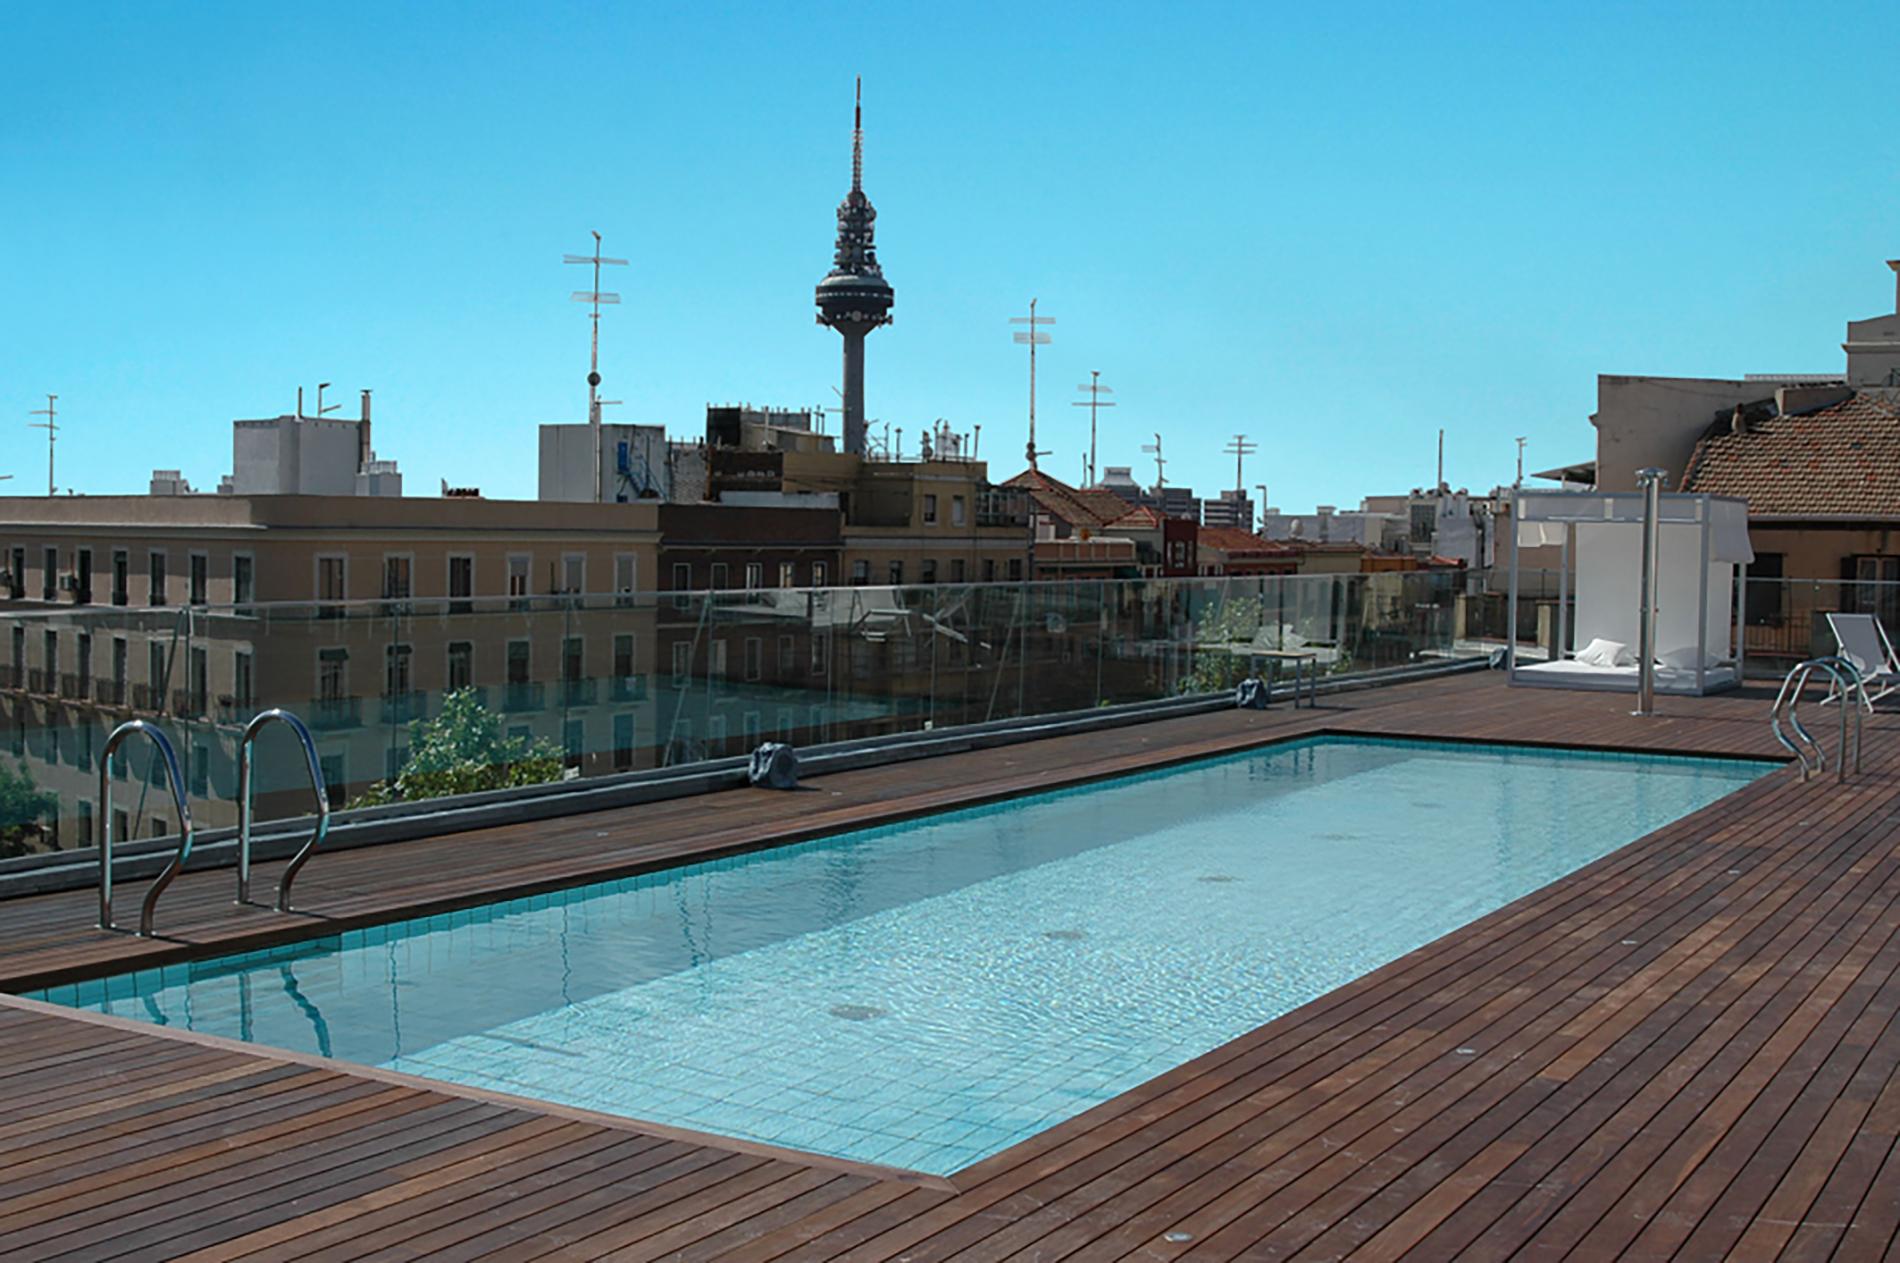 Gimnasio piscinas entrenamiento personal o2 centro for Piscina 02 manuel becerra